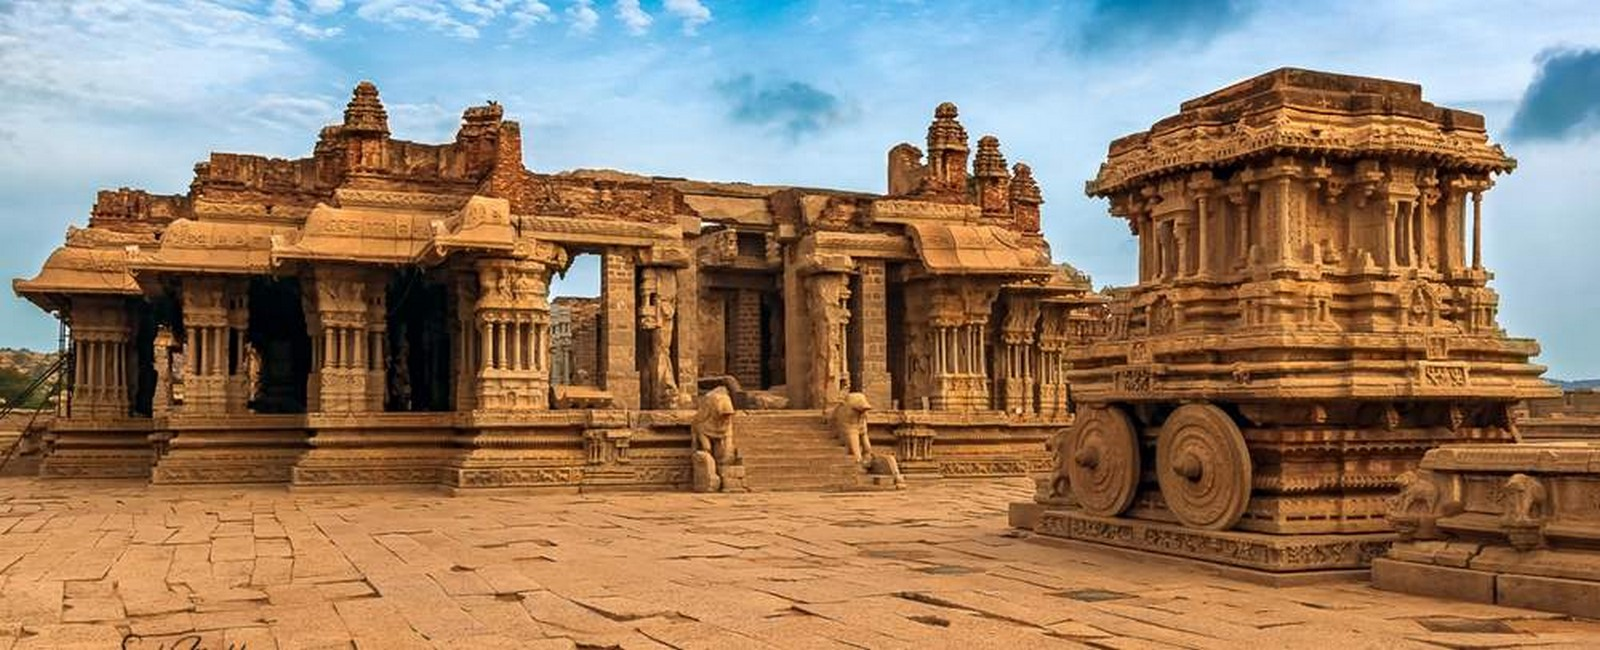 Vittala Temple Complex,Hampi, Karnataka,India - Sheet3